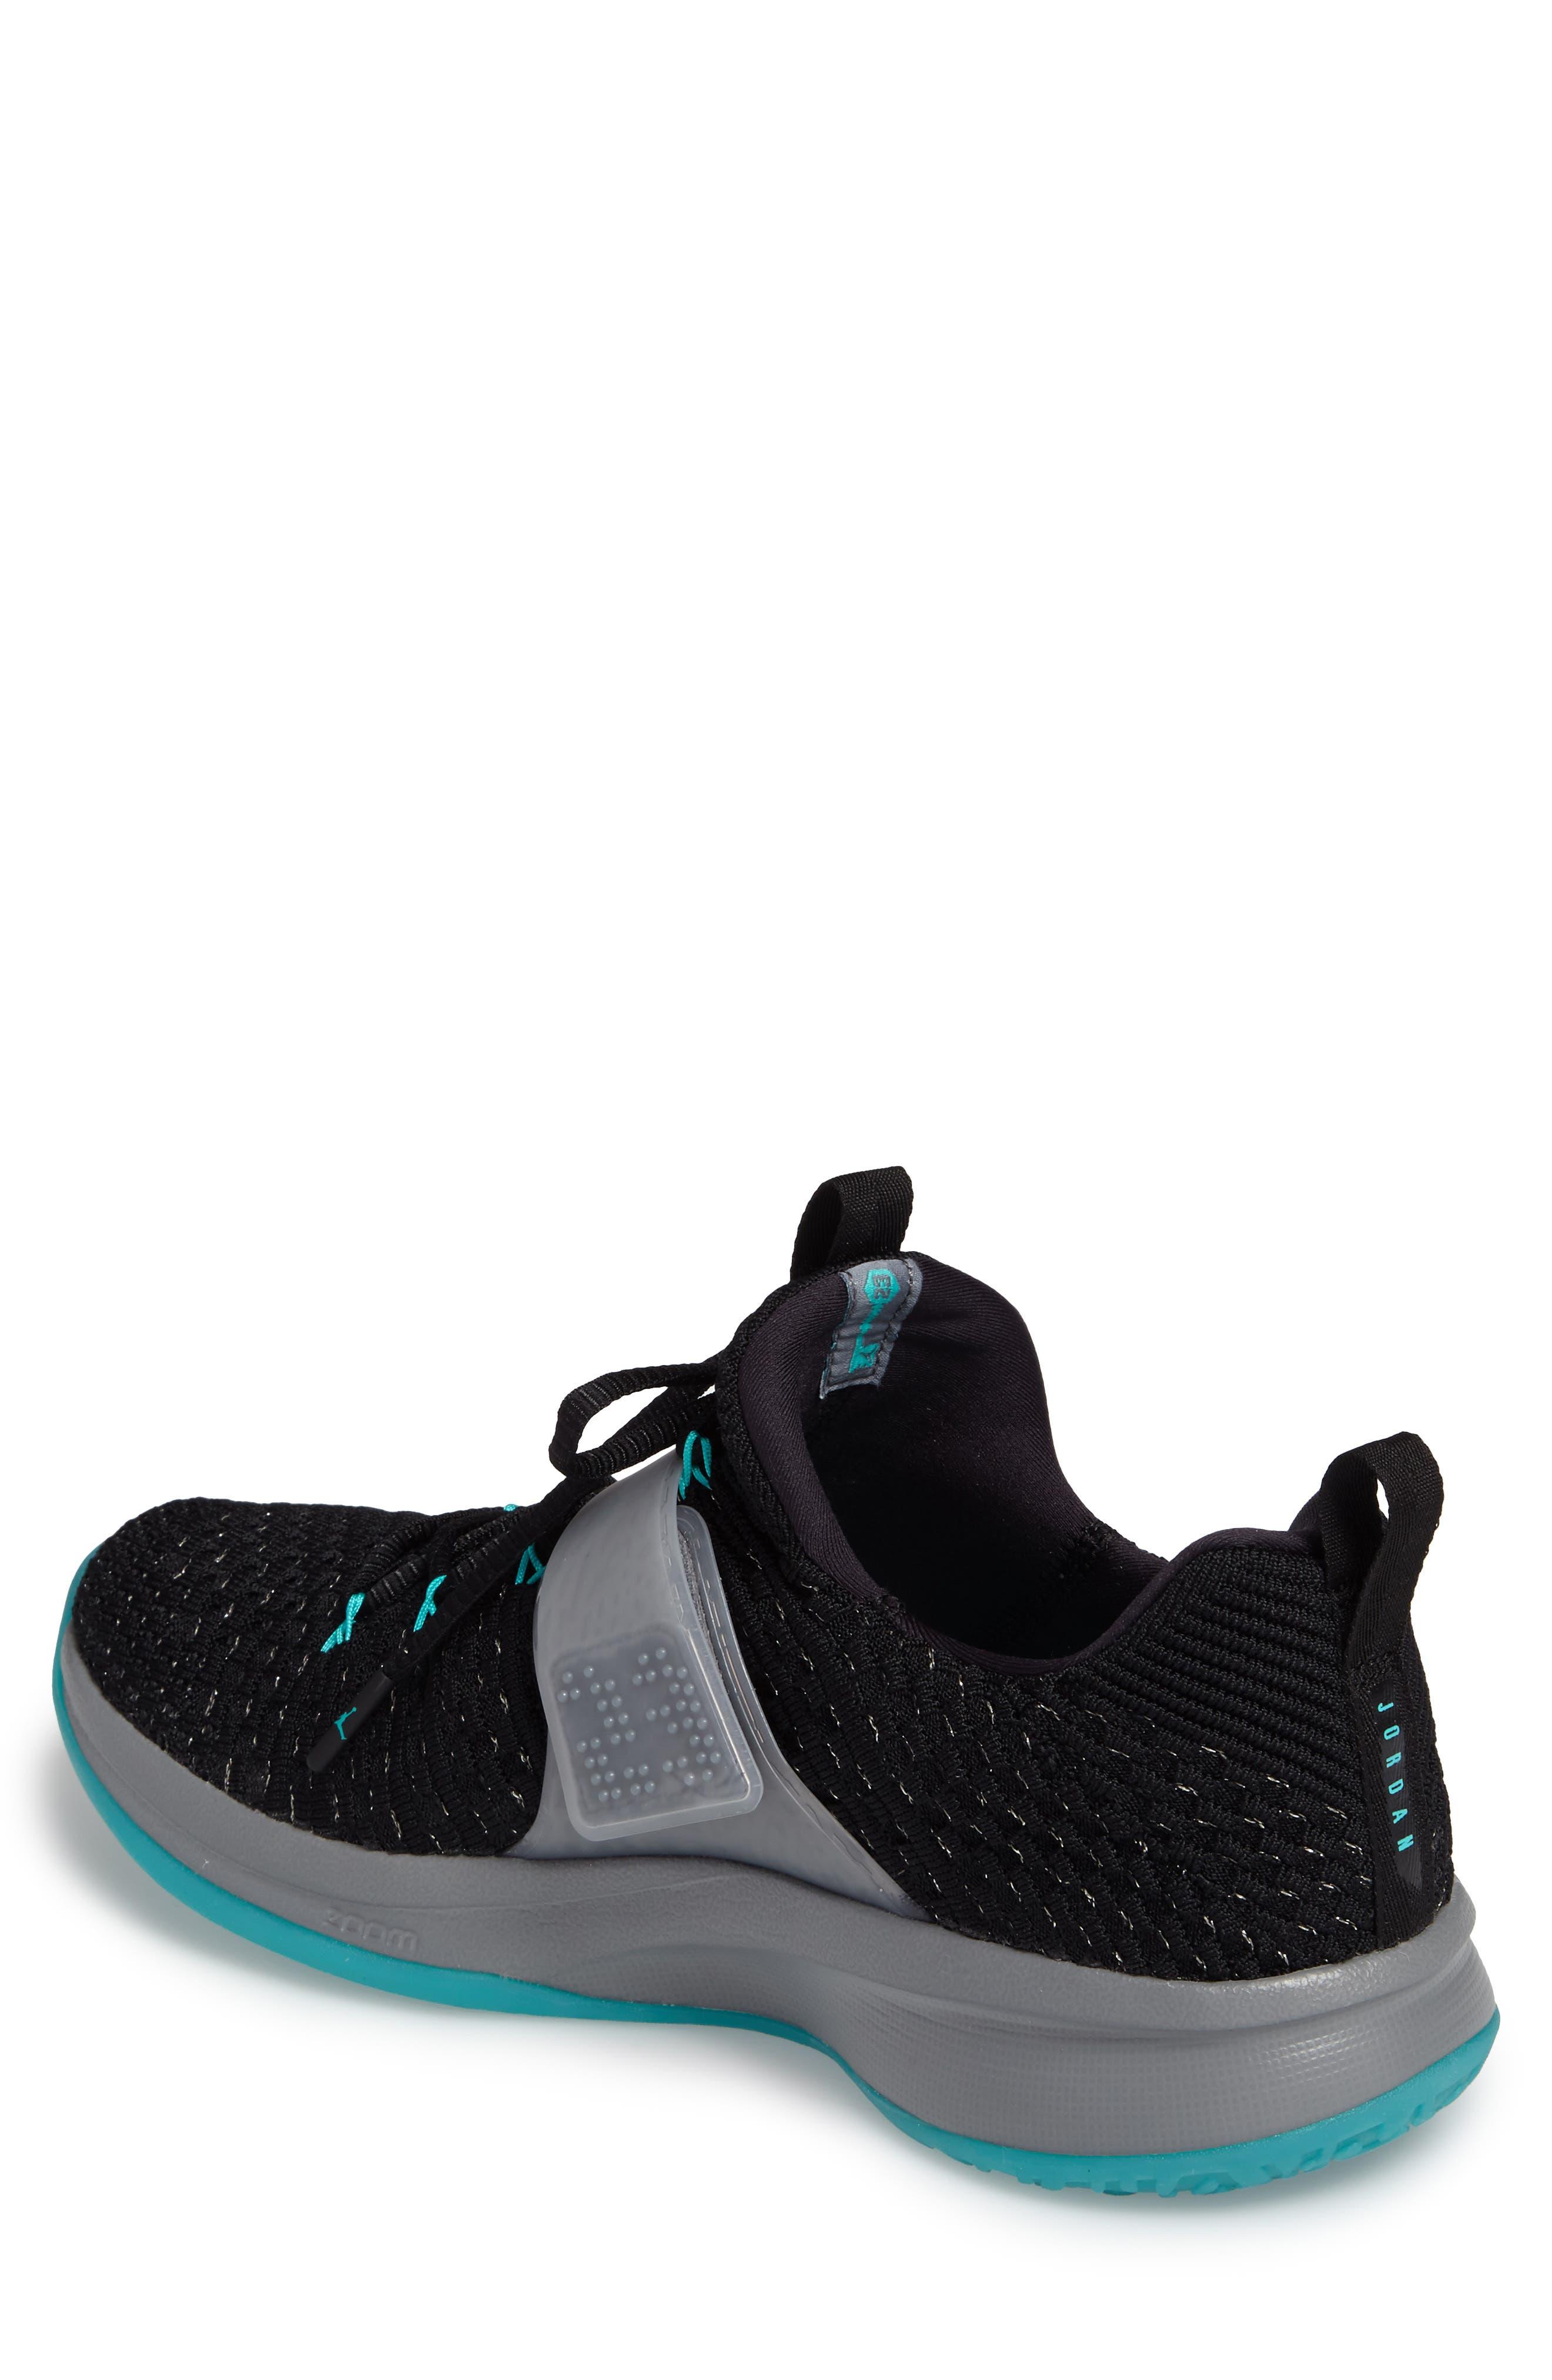 Jordan Flyknit Trainer 2 Low Sneaker,                             Alternate thumbnail 8, color,